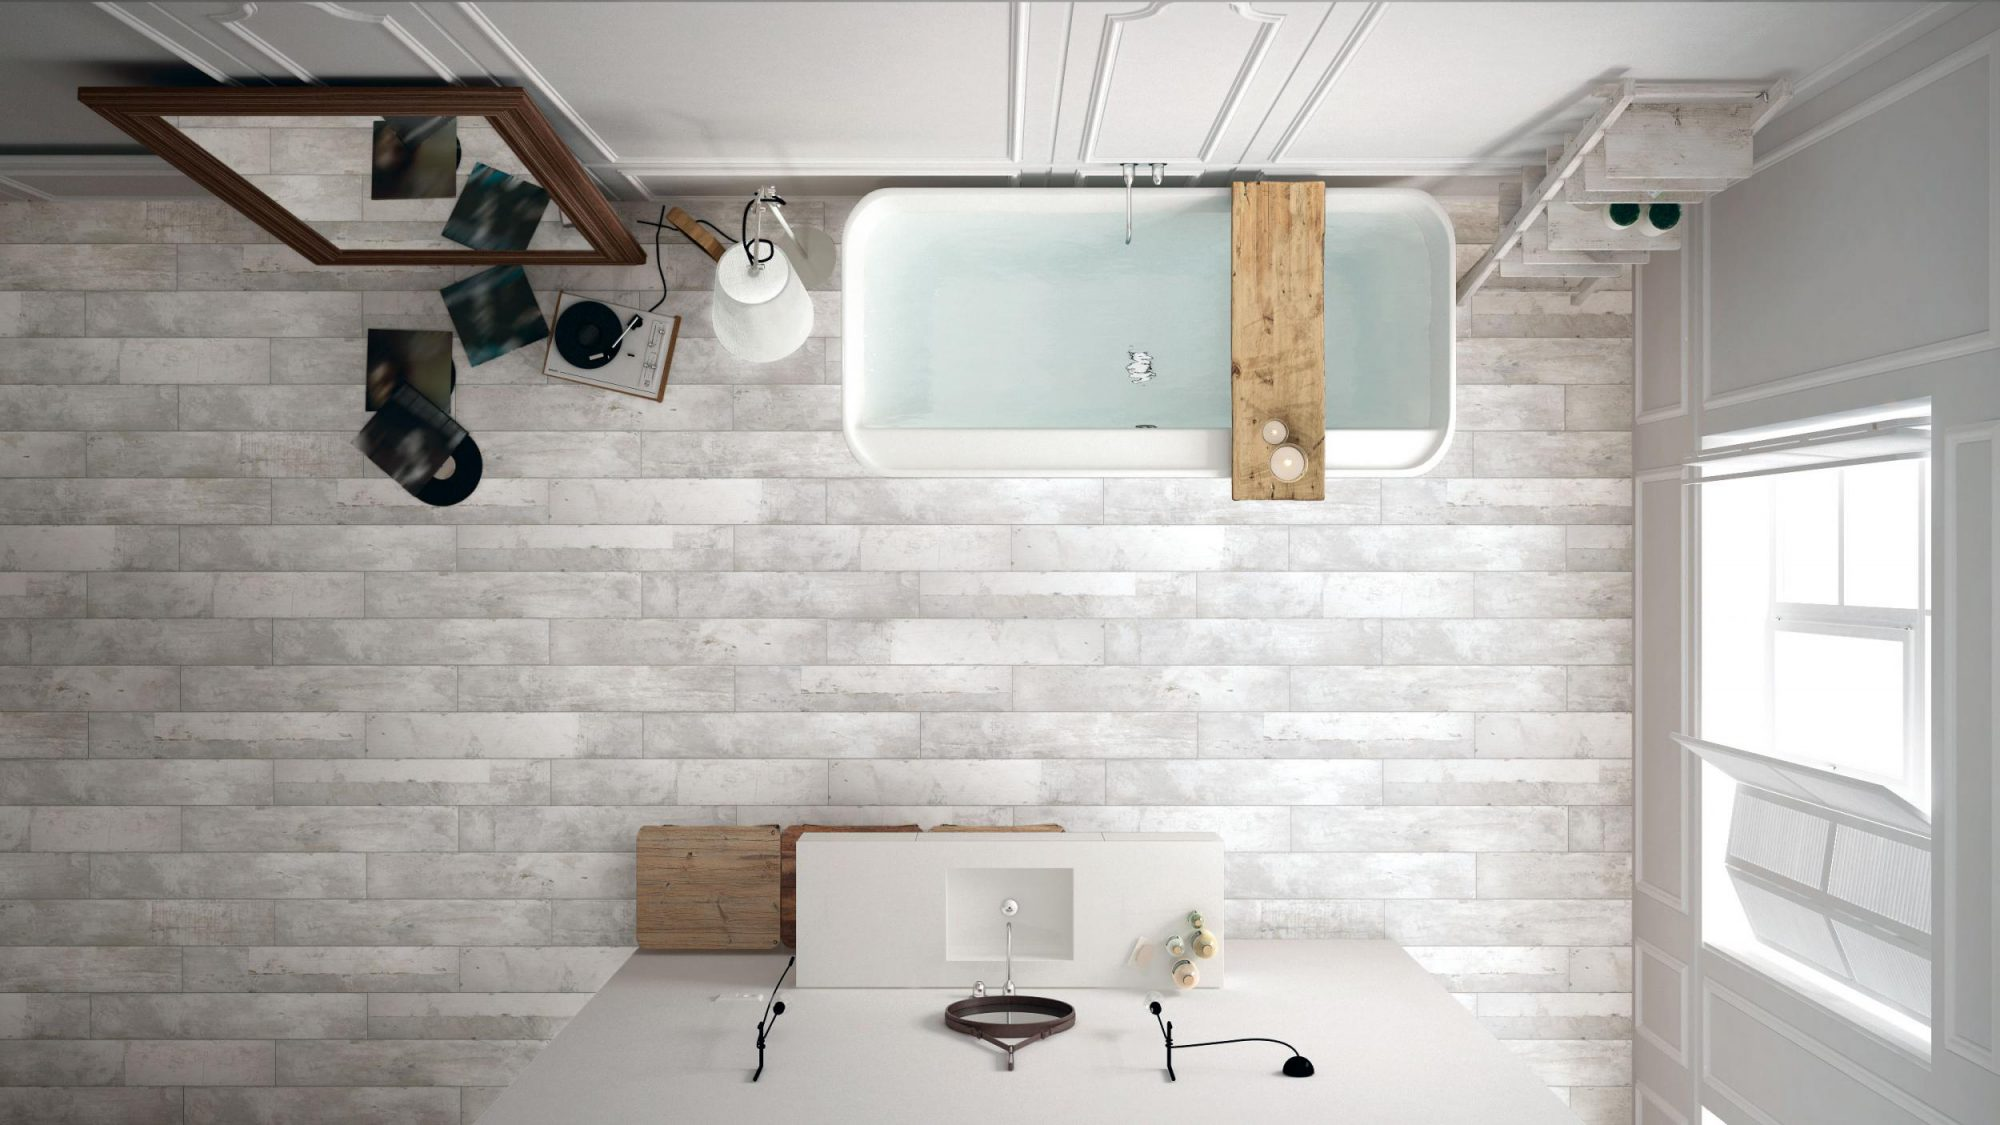 Vintage Tegels Badkamer : Sphinx tegels badkamer